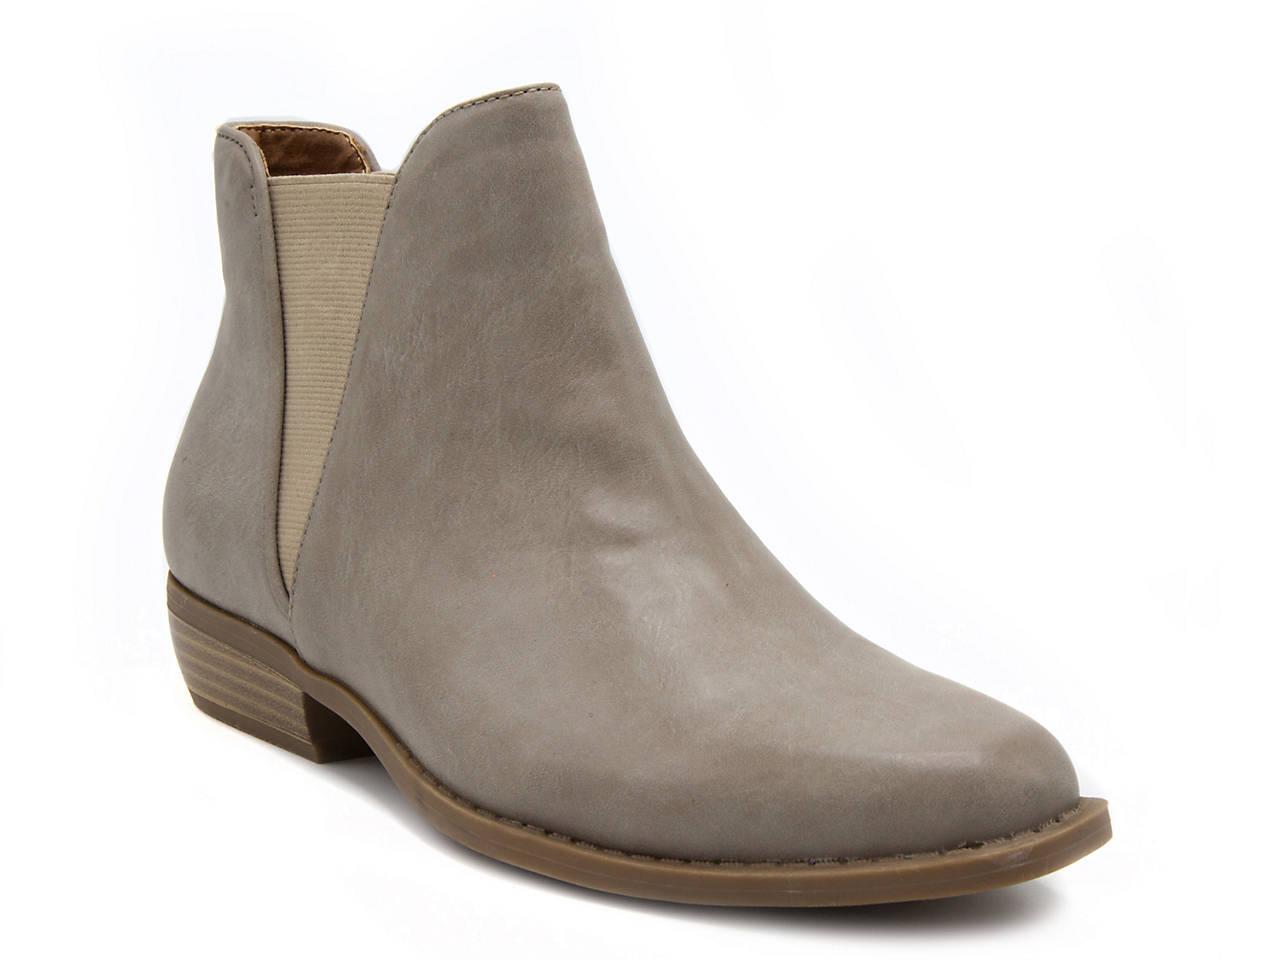 Rampage Leesa Women's Ankle ... Boots discount popular pSUuN